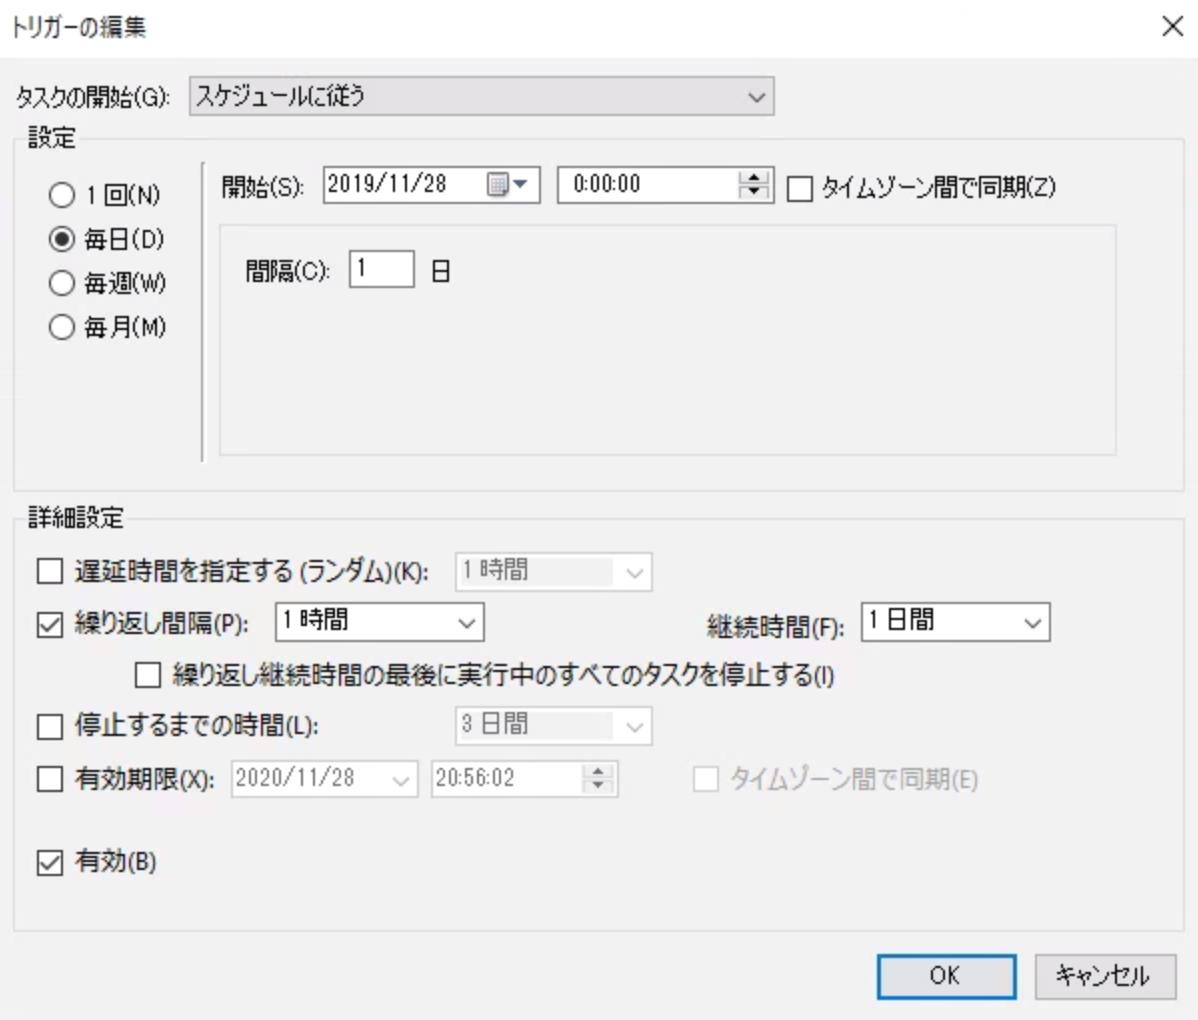 f:id:onsanai:20191128205628p:plain:w300